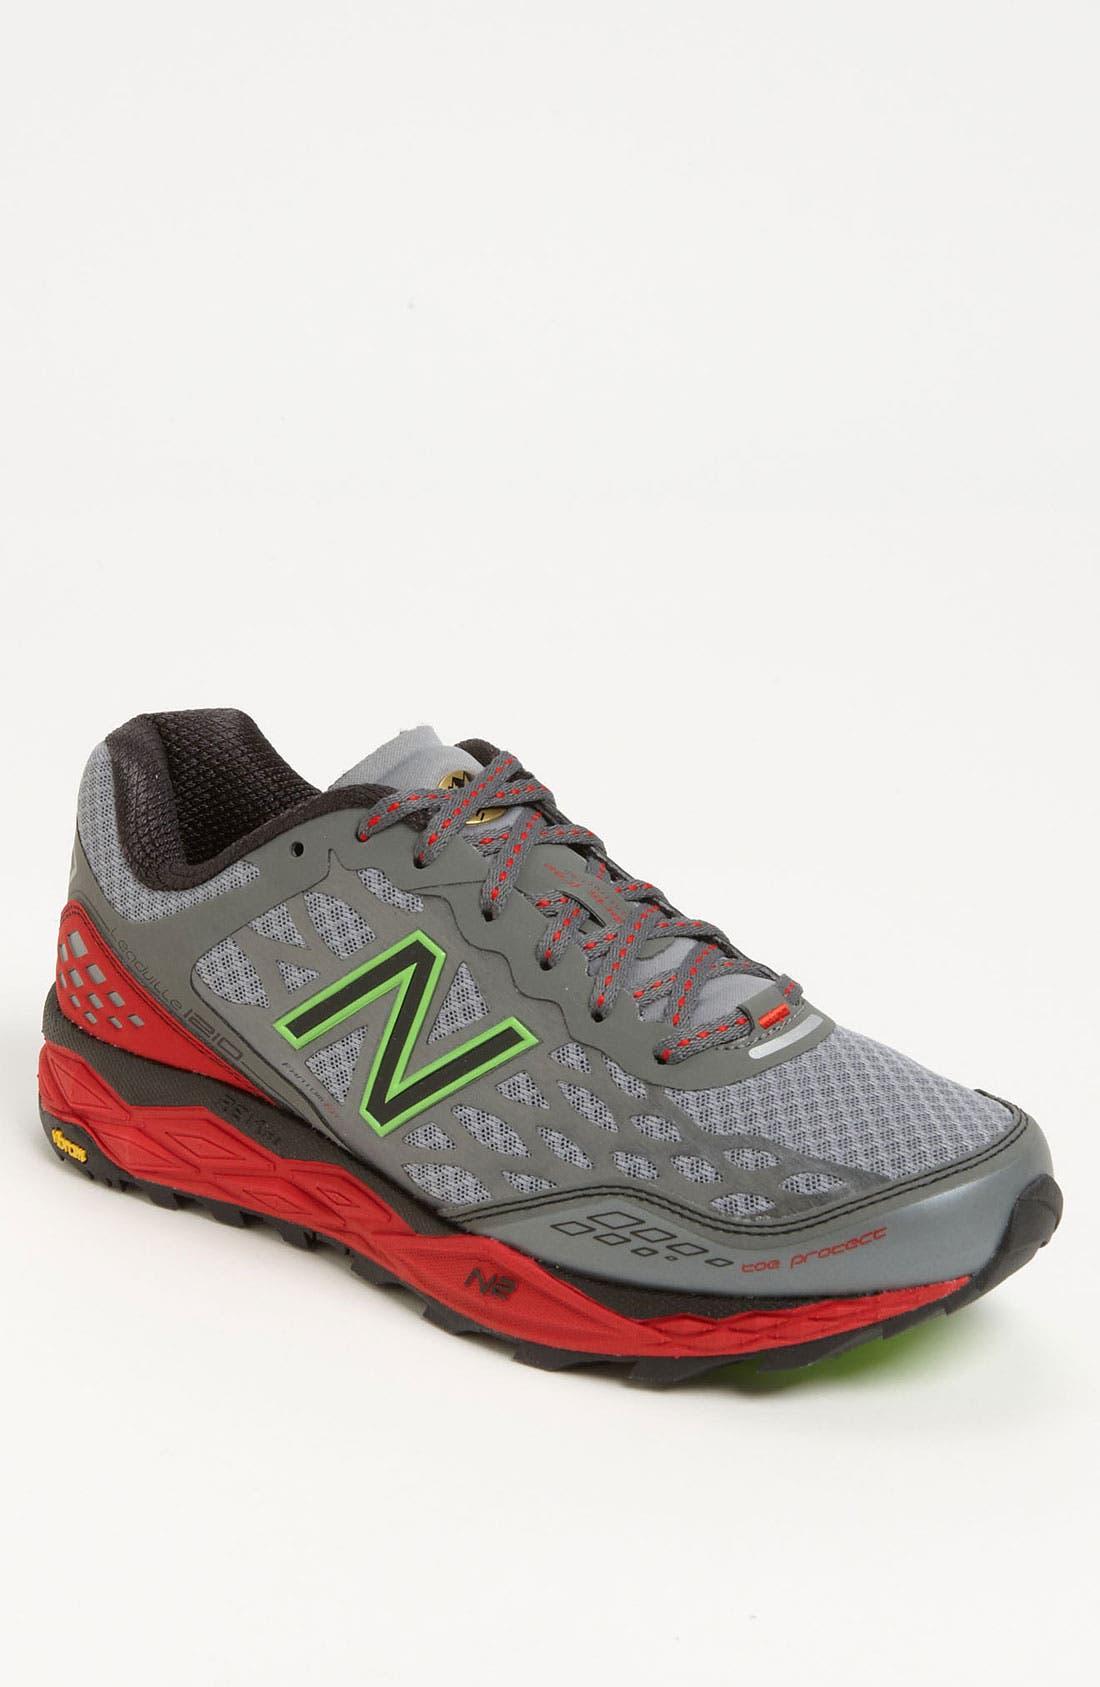 Main Image - New Balance '1210' Trail Running Shoe (Men)